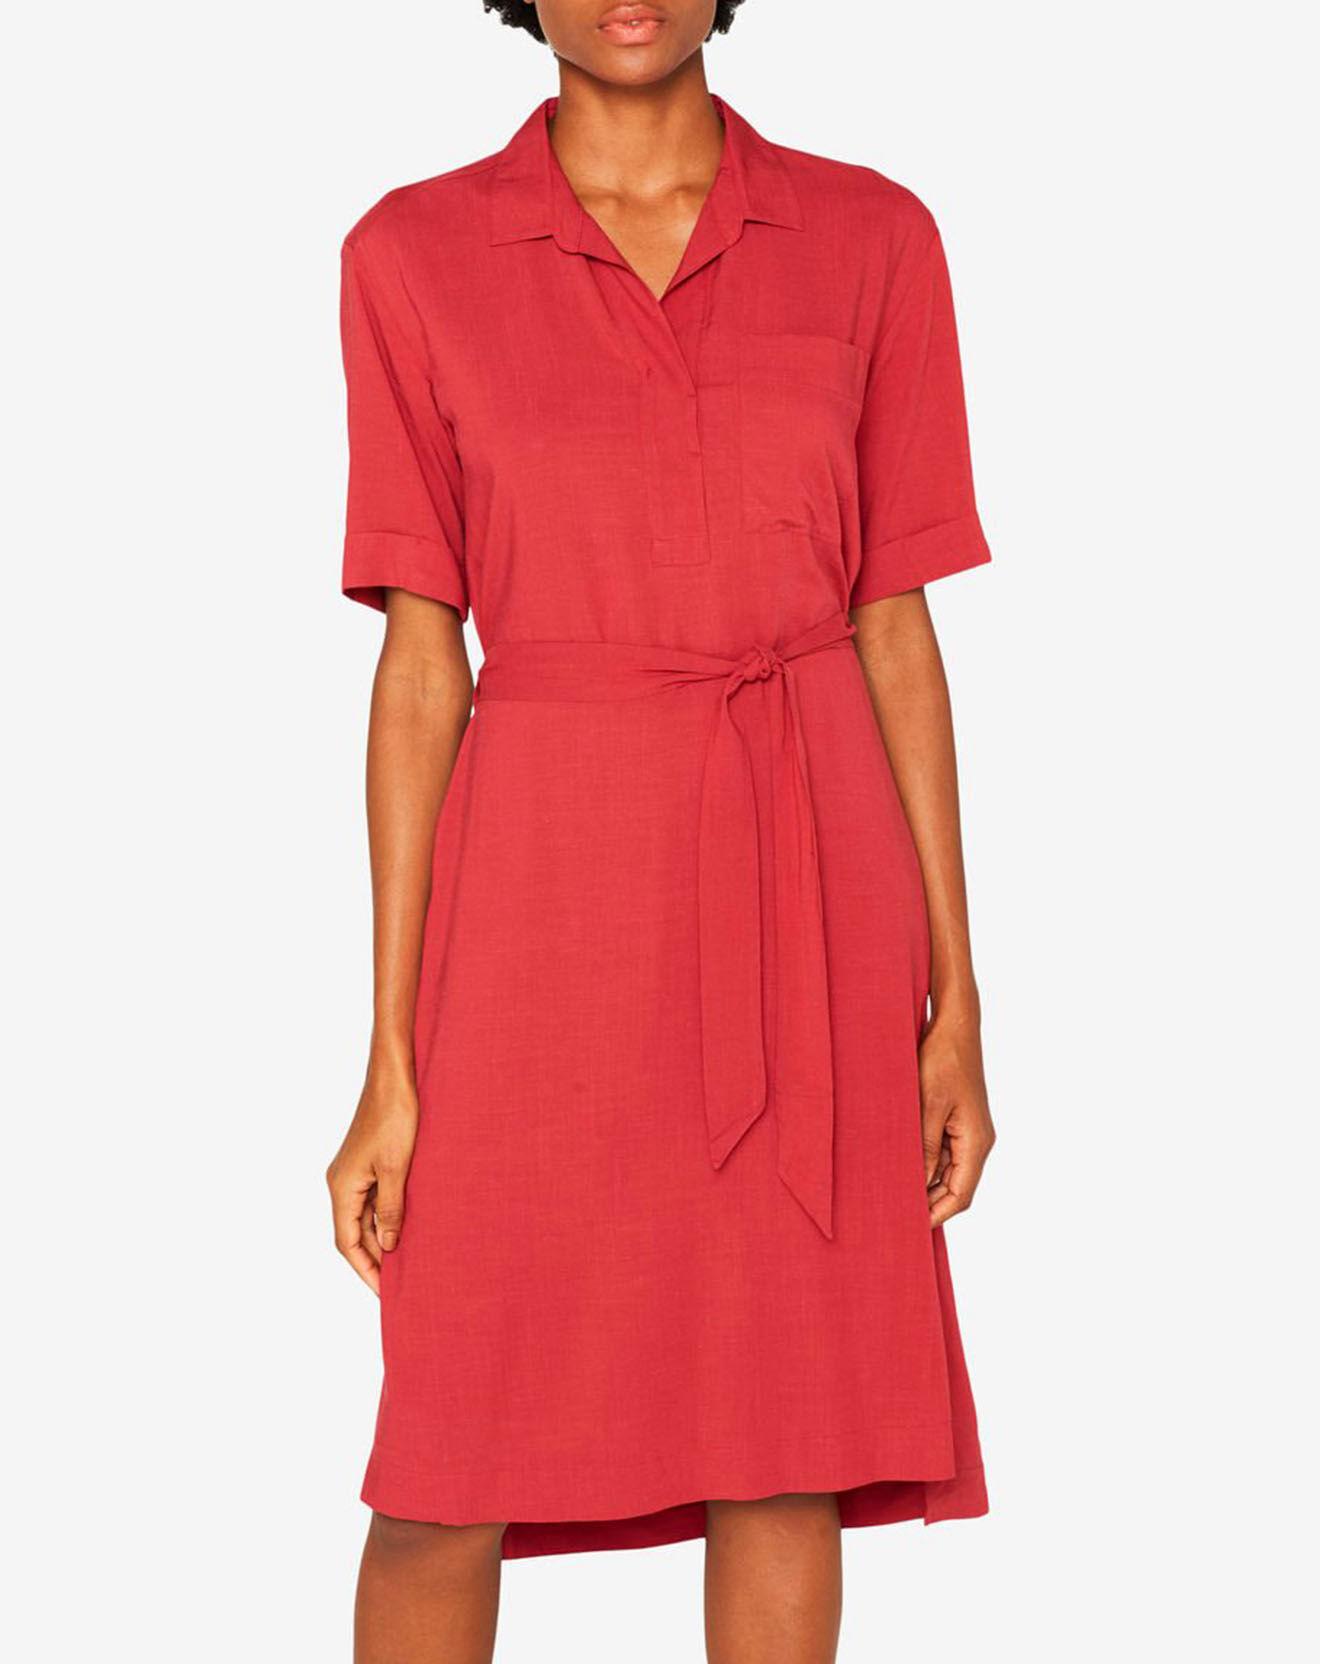 Robe Midi en Lin mélangé rouge - Esprit - Modalova